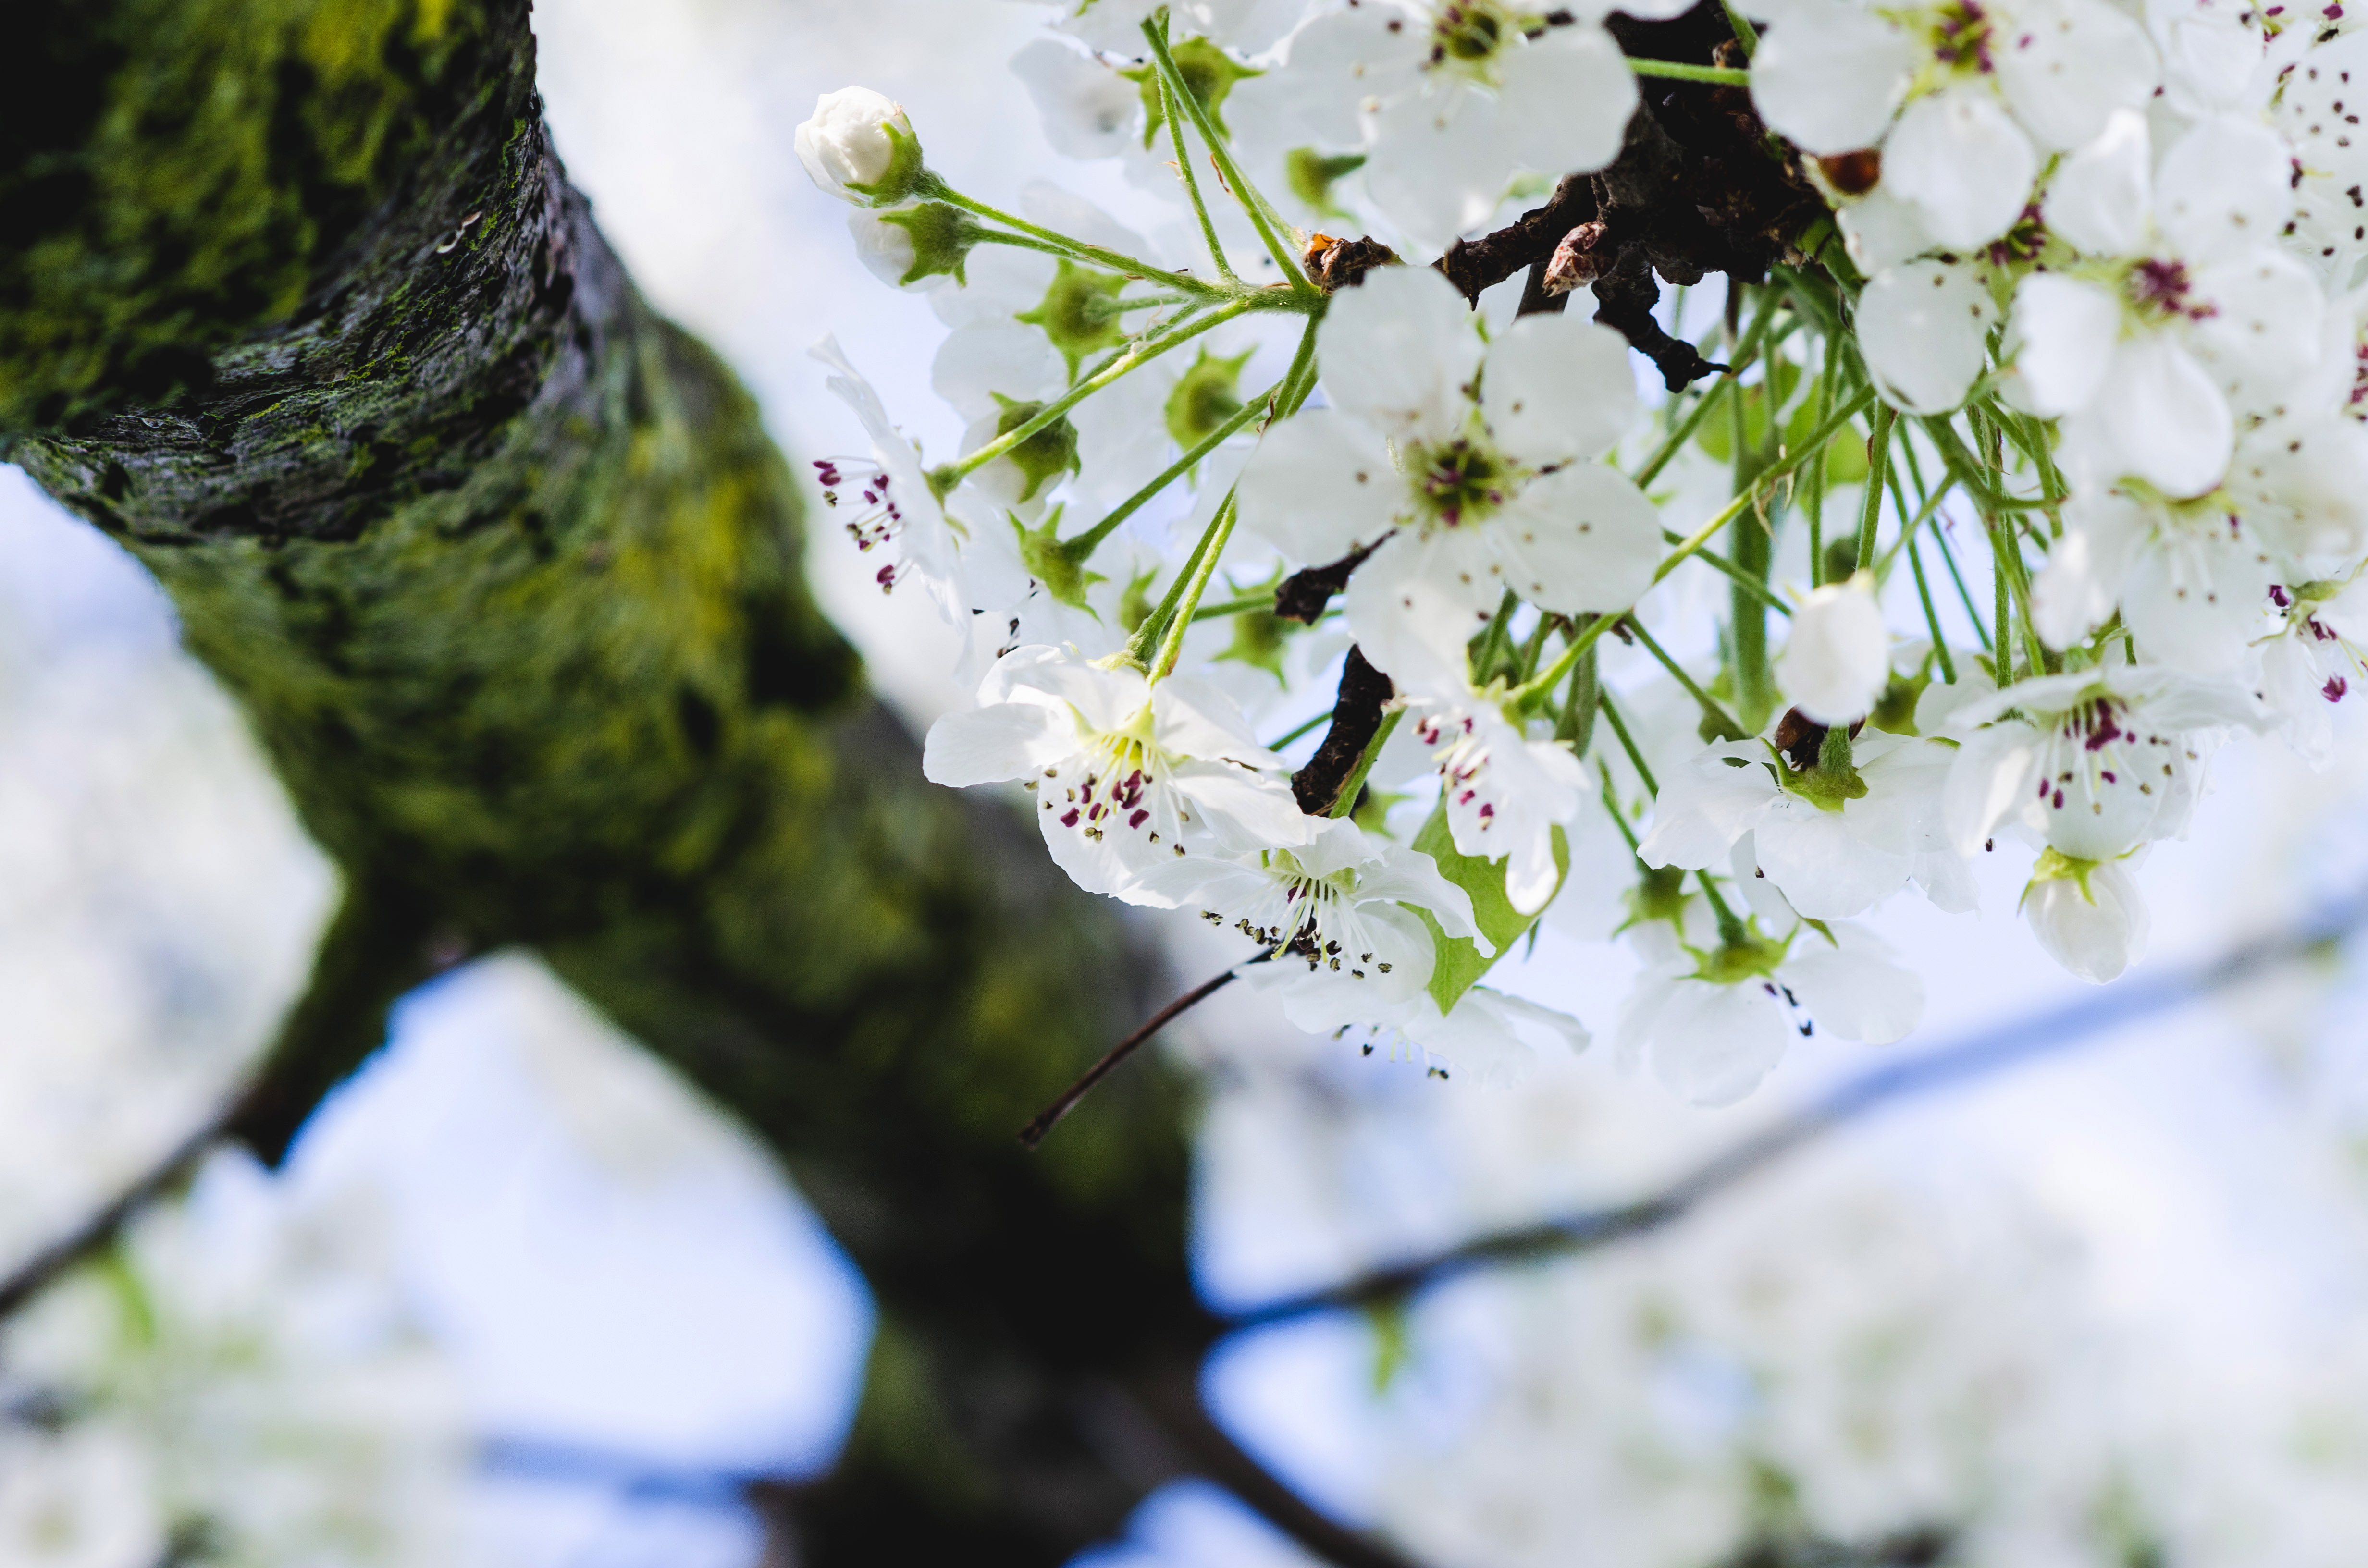 White Flowers On Tree In Trenton New Jersey Image Free Stock